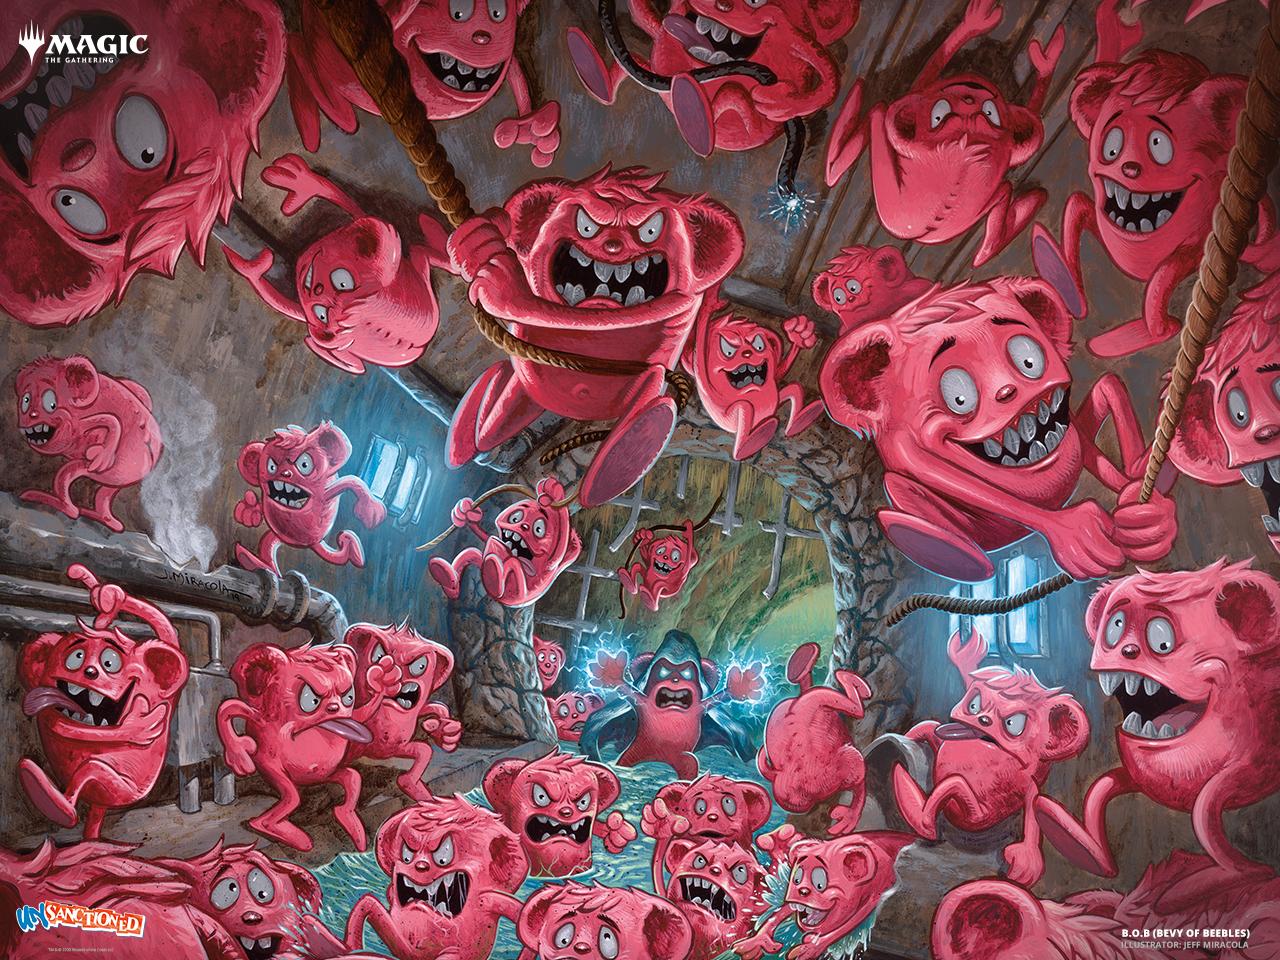 bevy of beebles, mtg, wallpaper 2020